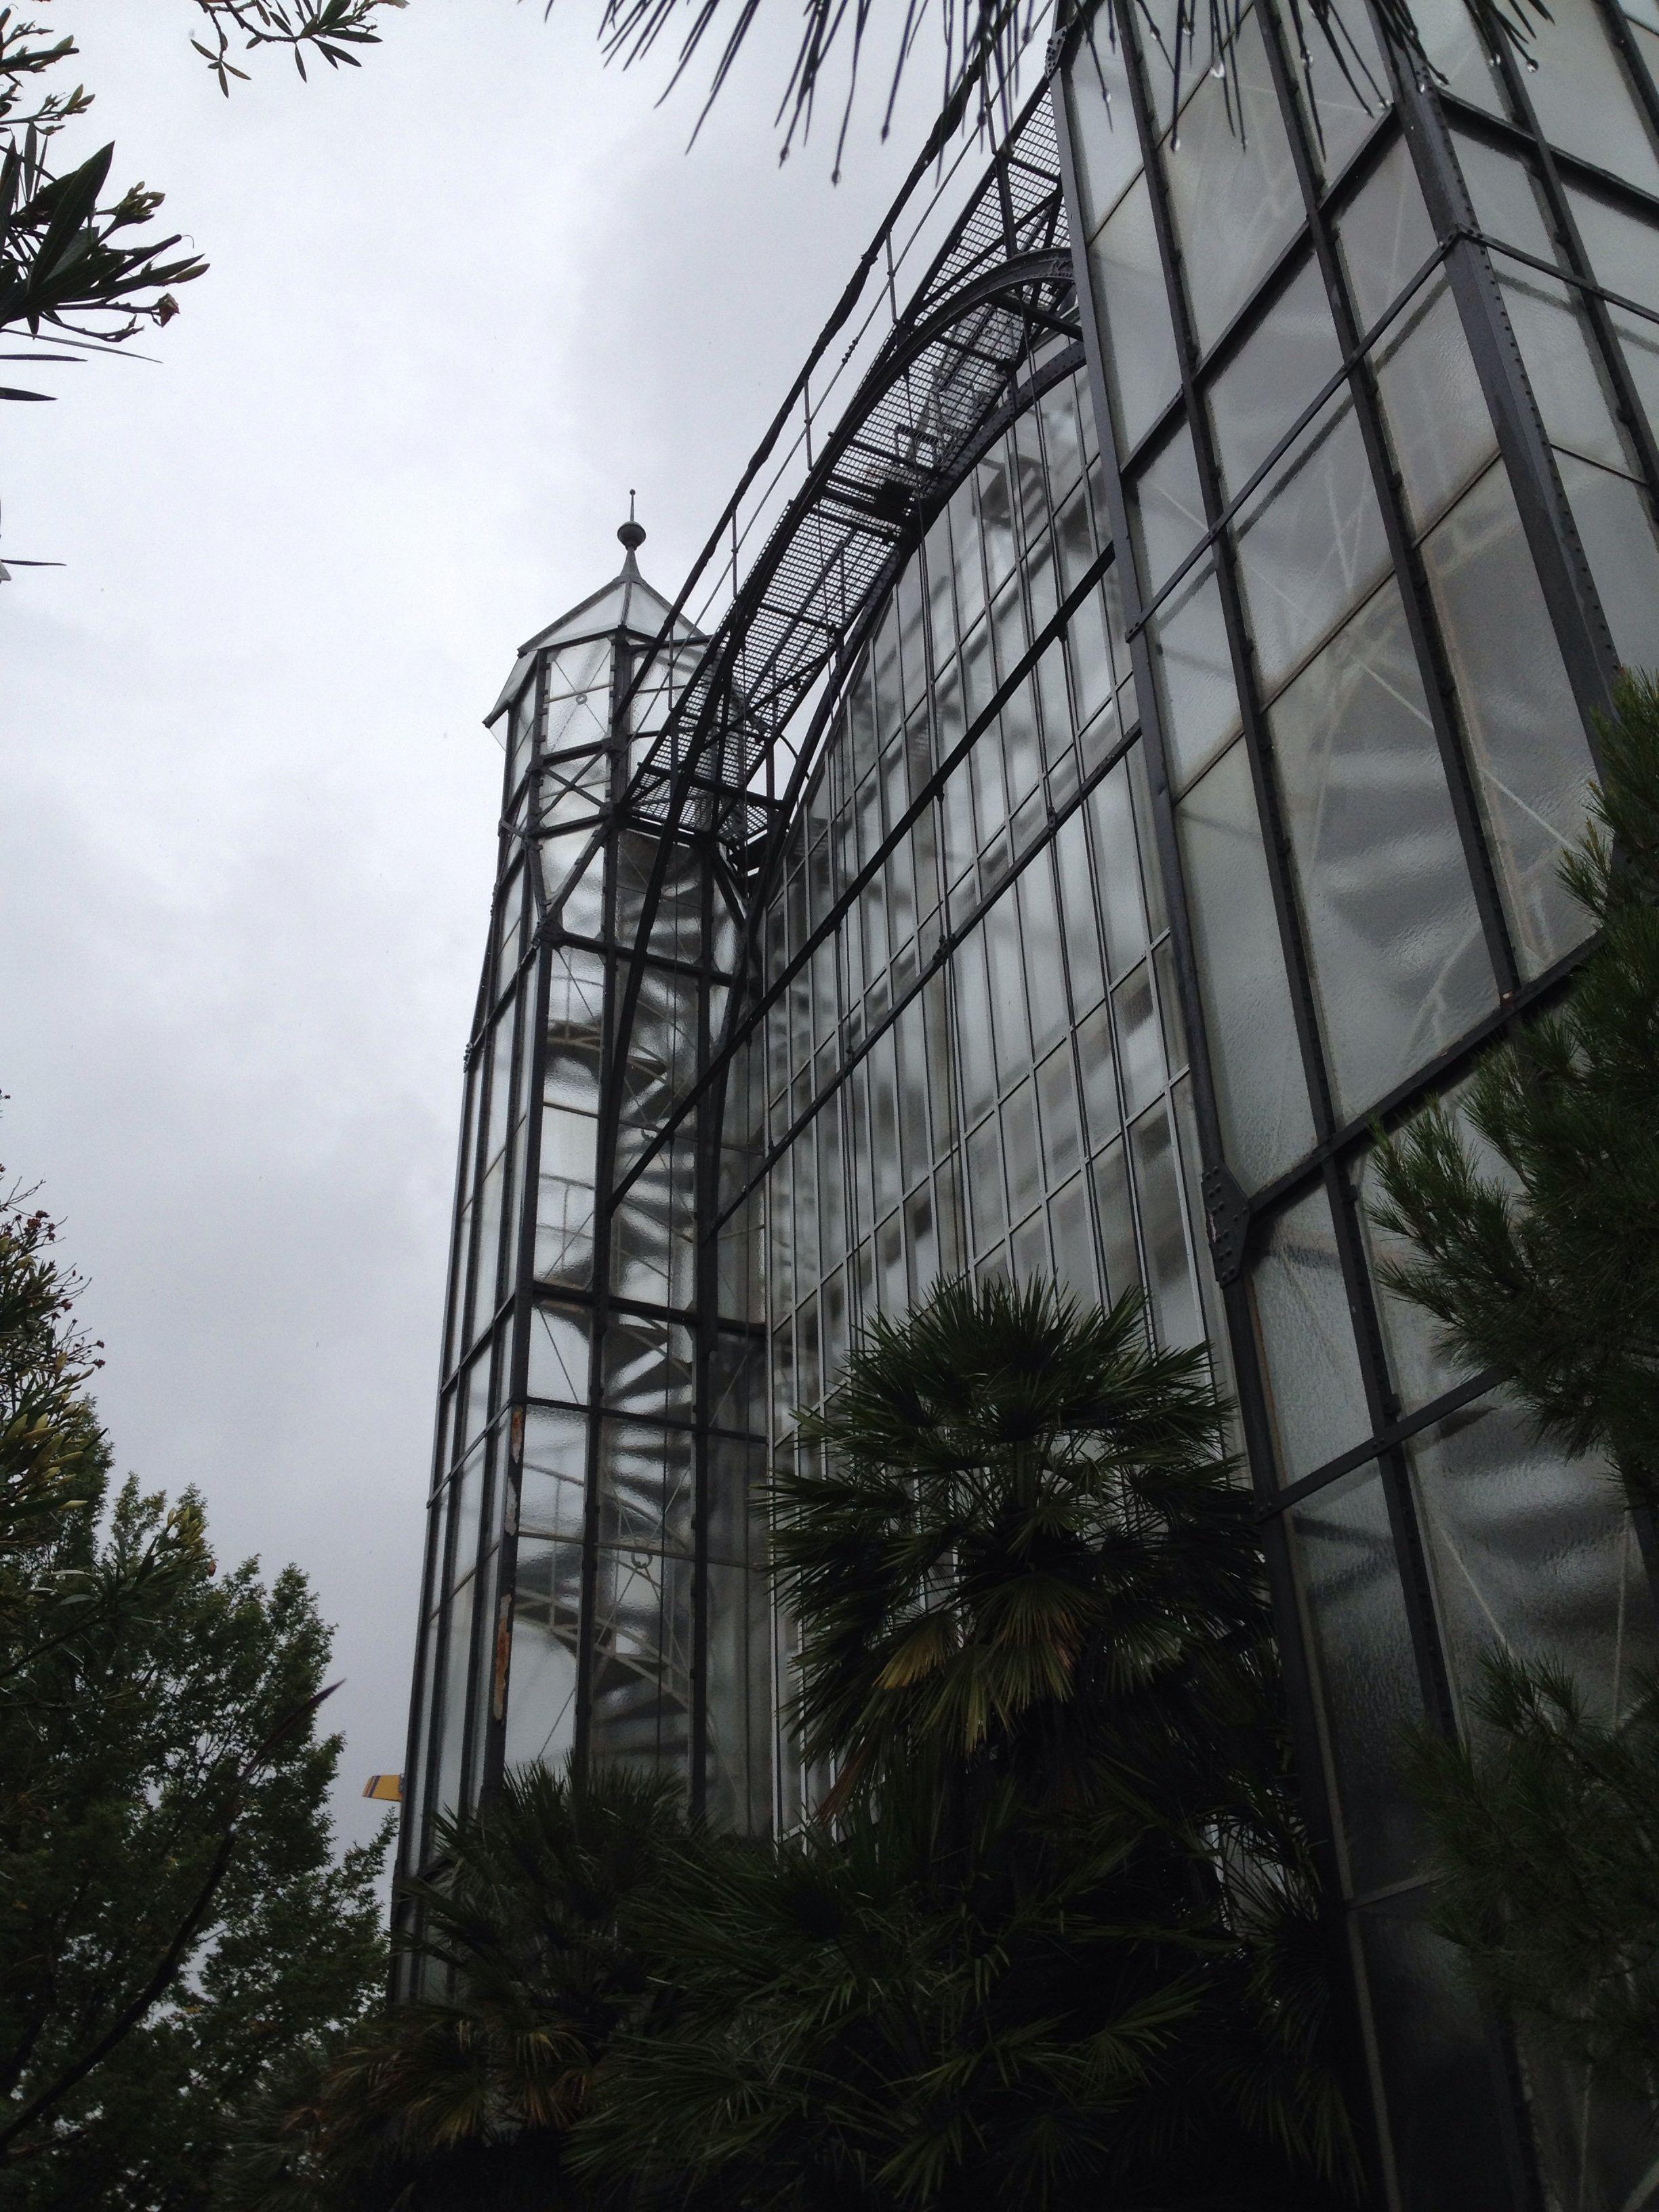 Berlindahlem Botanischen Garten Botanischen Garten Berlin Dahlem In 2020 Explore Berlin Utility Pole